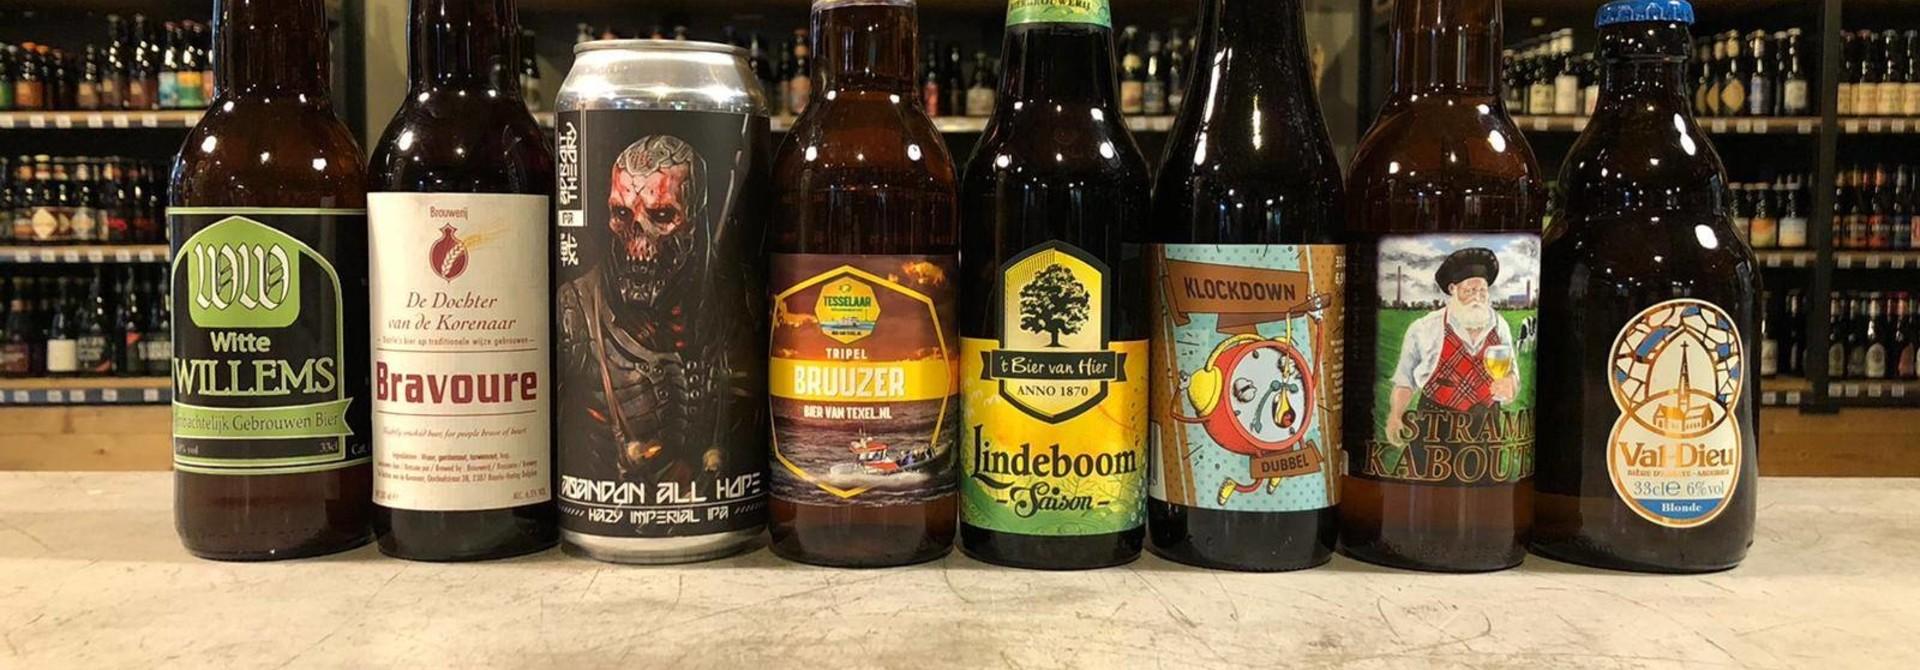 Speciaalbier – bierpakket april 2021